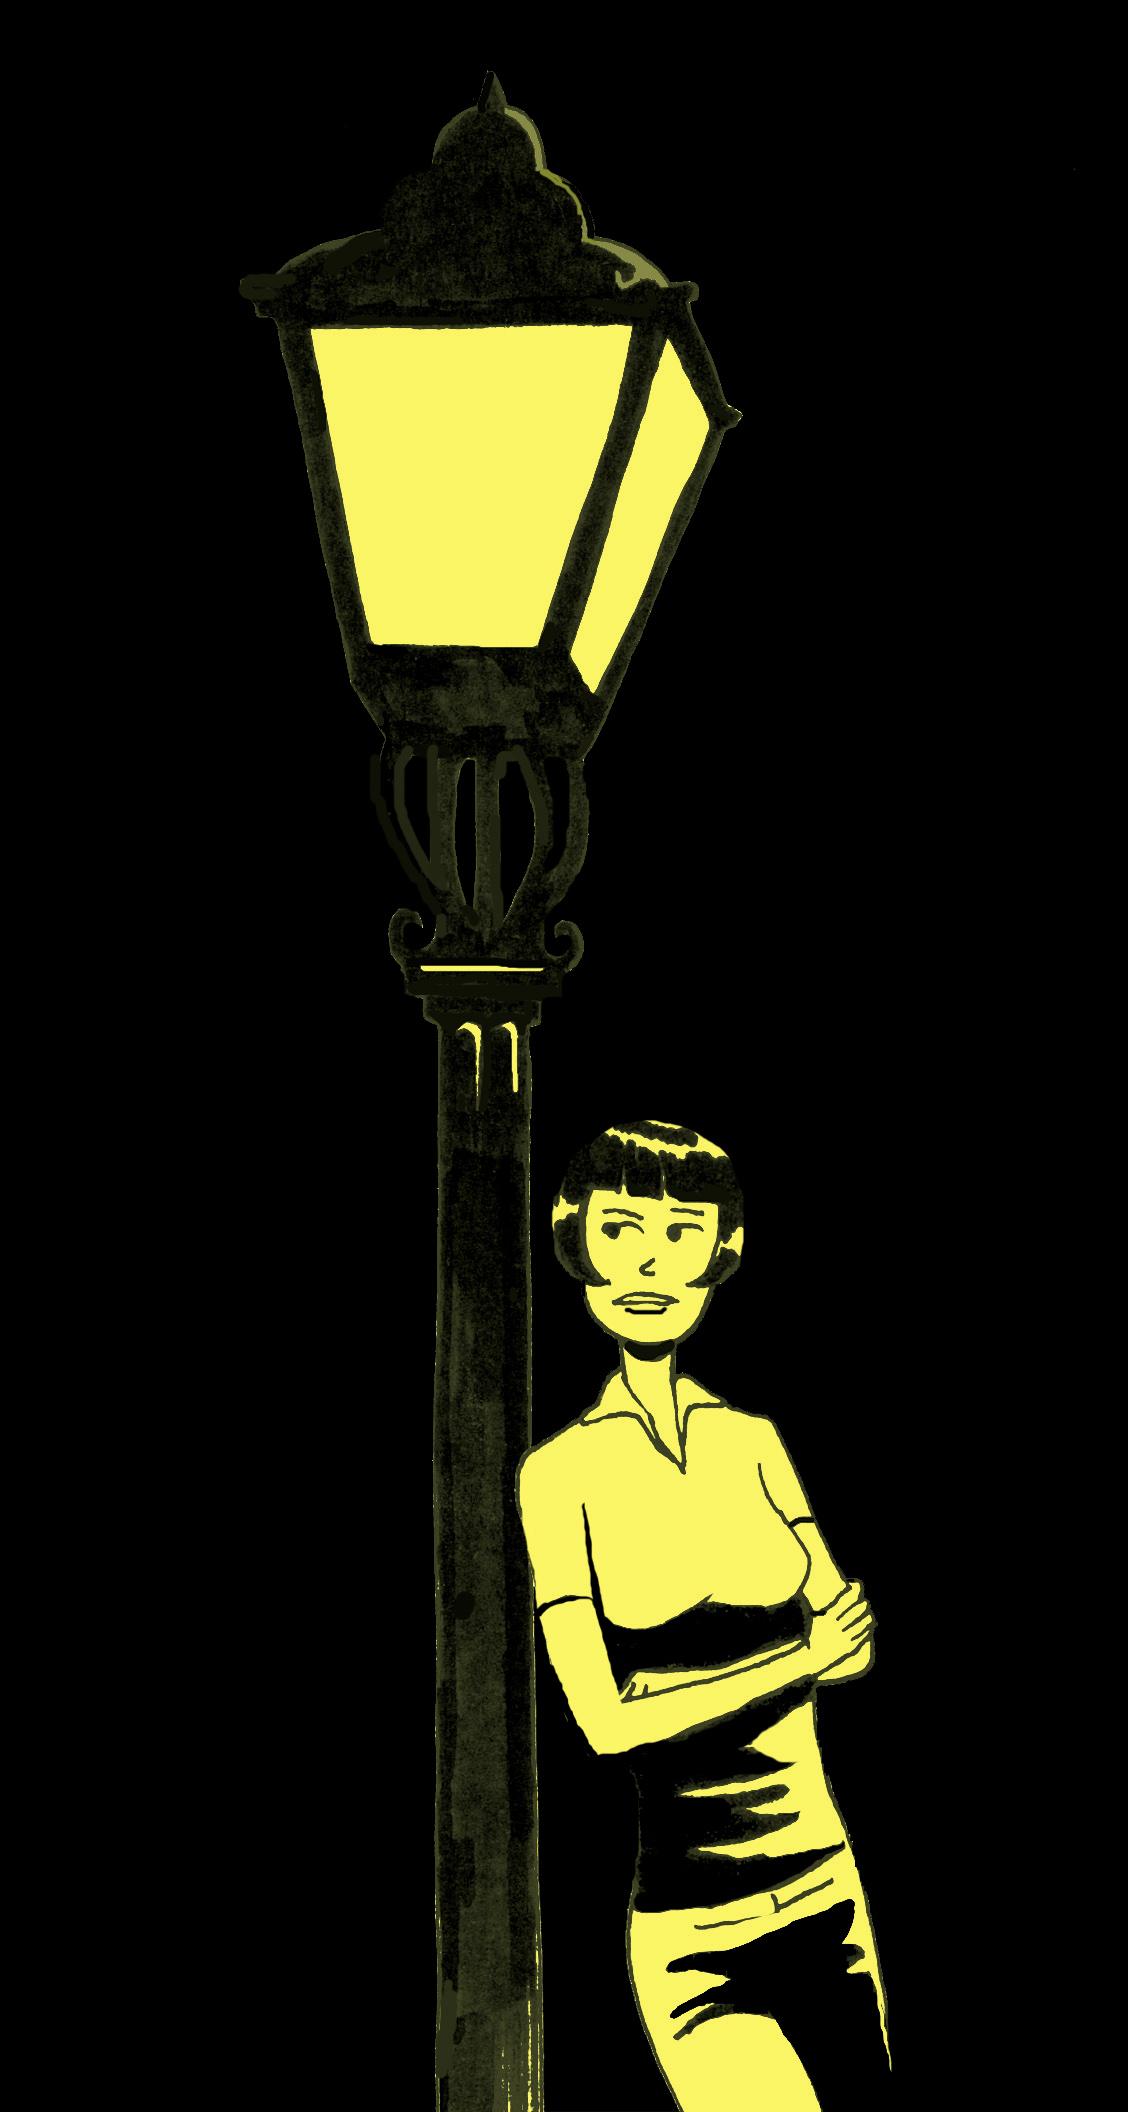 File:Amanda Kayne-319 Dark Street.jpg - Wikimedia Commons